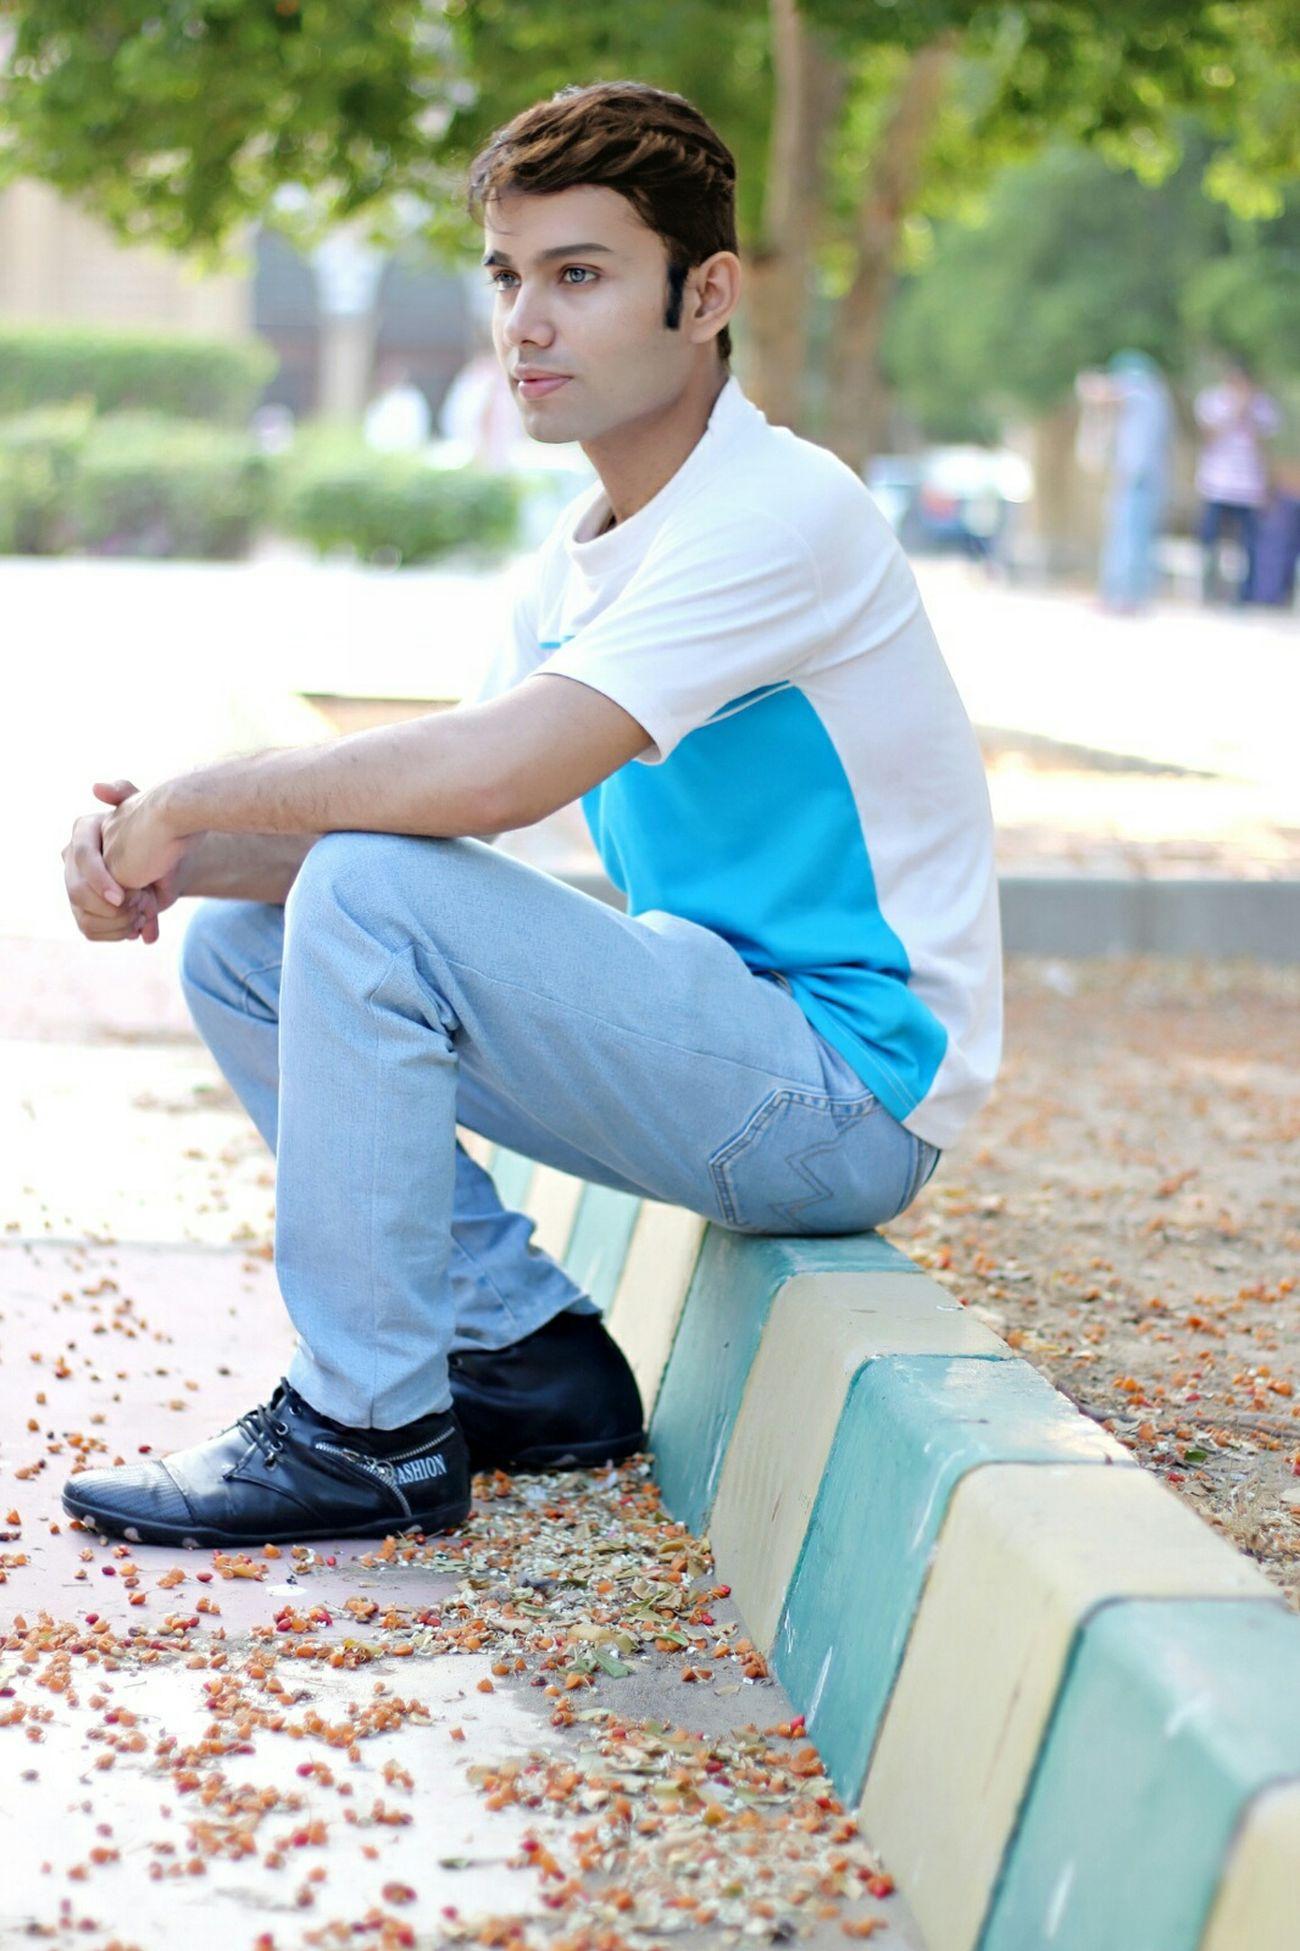 Portrait Model Happy People Hot Boy Cute Karachi Handsome Boy Cute♡ Handsome Sexyboy Hot_shotz That's Me Rajput Faixy.raj Faizy.clixs Muslim❤️ Faizan Rajpoot Boy Faixy Raj Pakistani Pakistan Faizanrjput EyeEm Best Edits EyeEm Best Shots Urdu